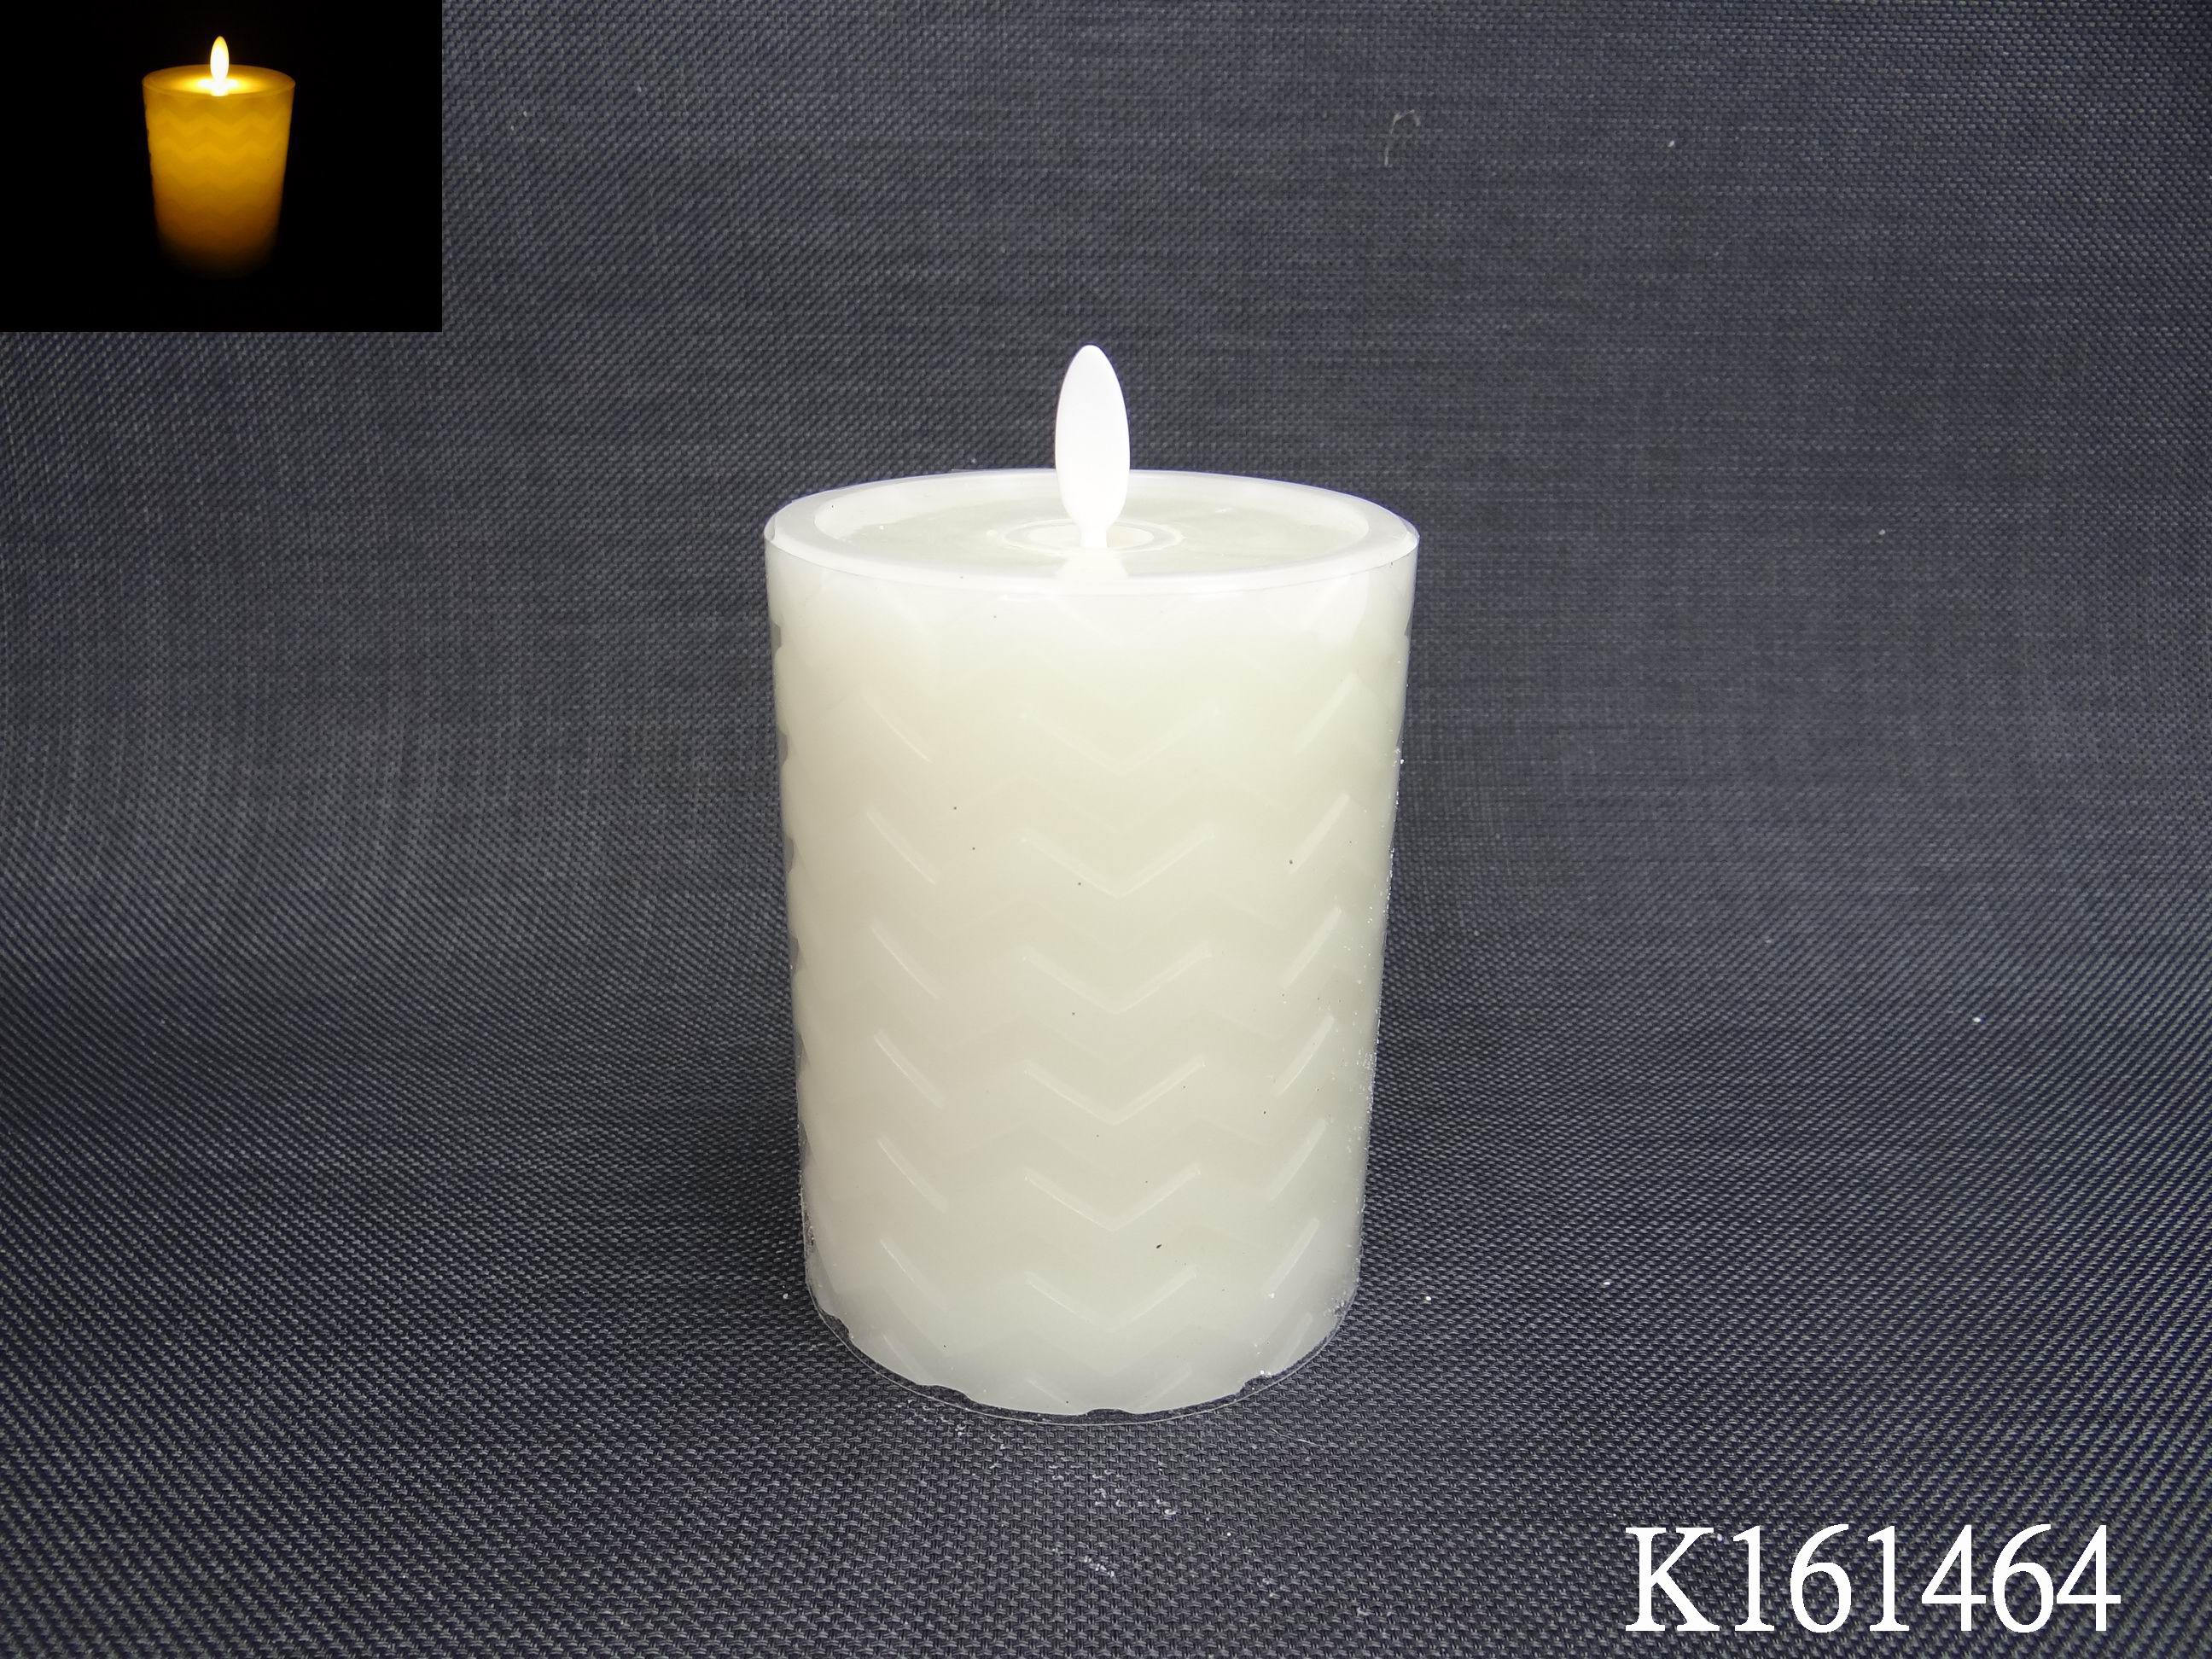 K161464